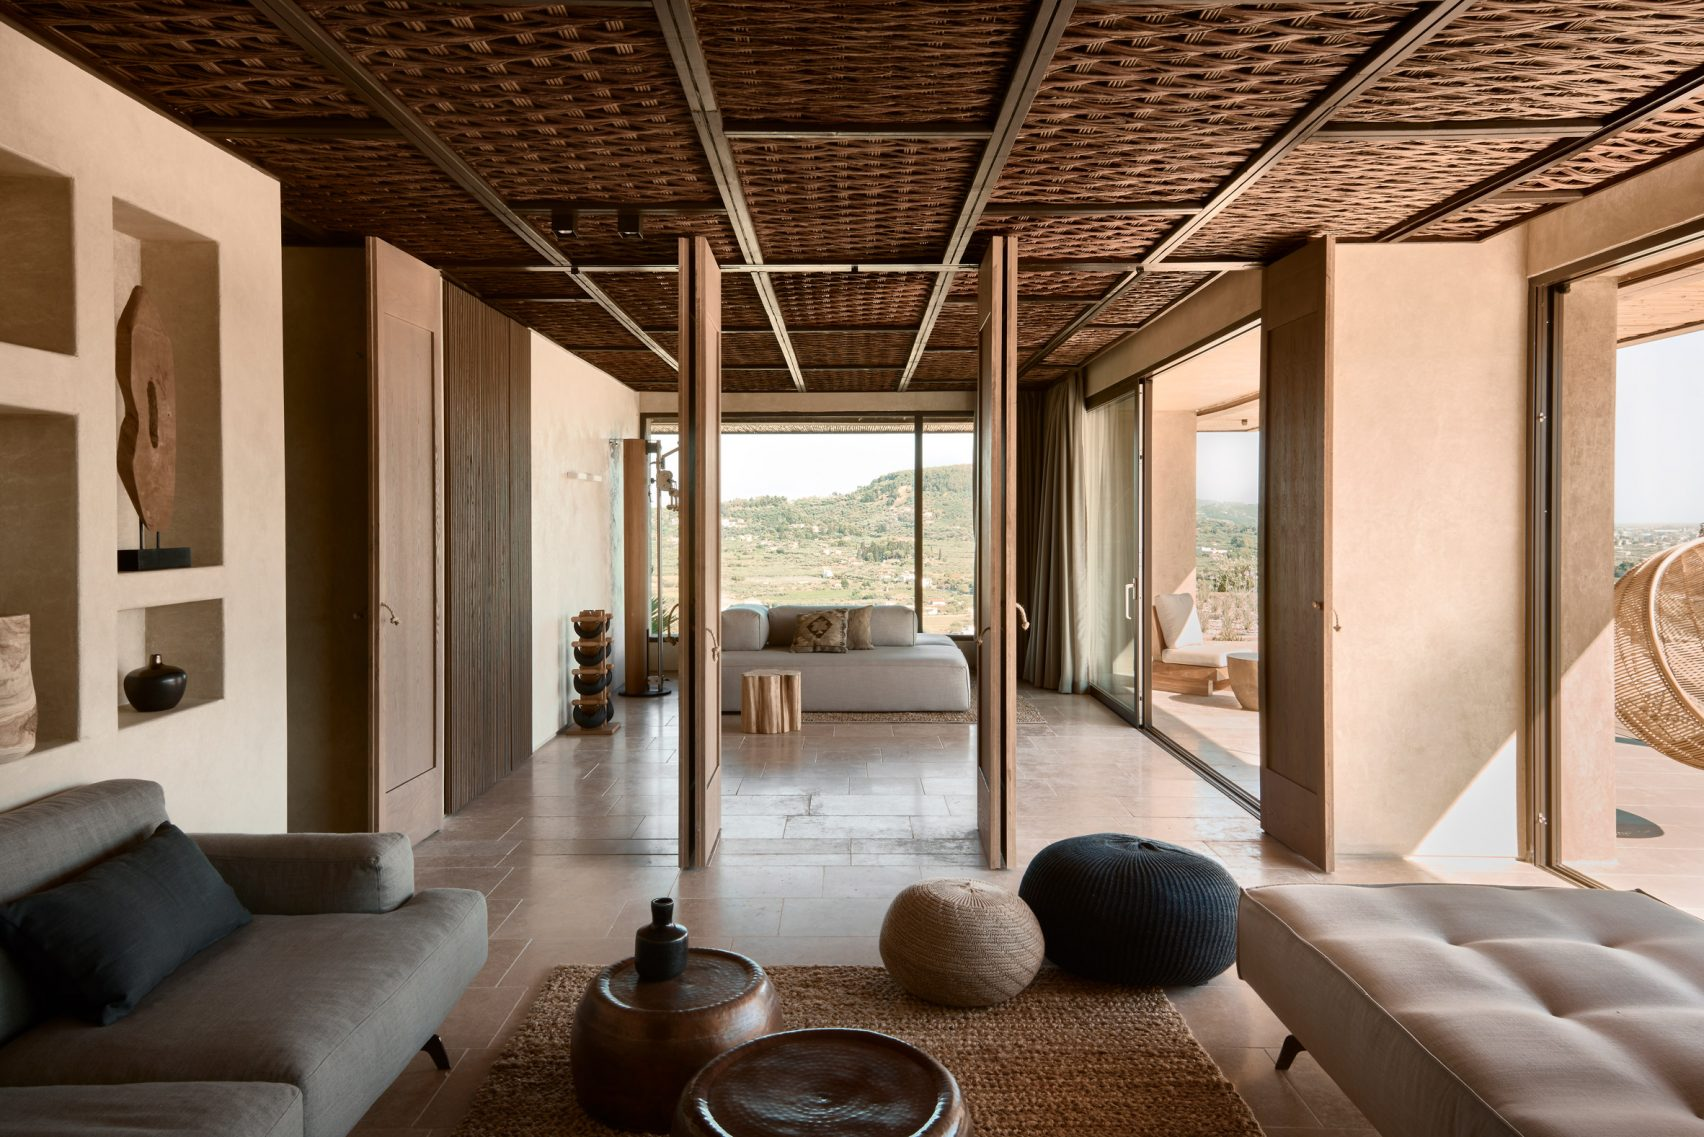 olea hotel bequeme sitzgelegenheit mit traditionellen elementen